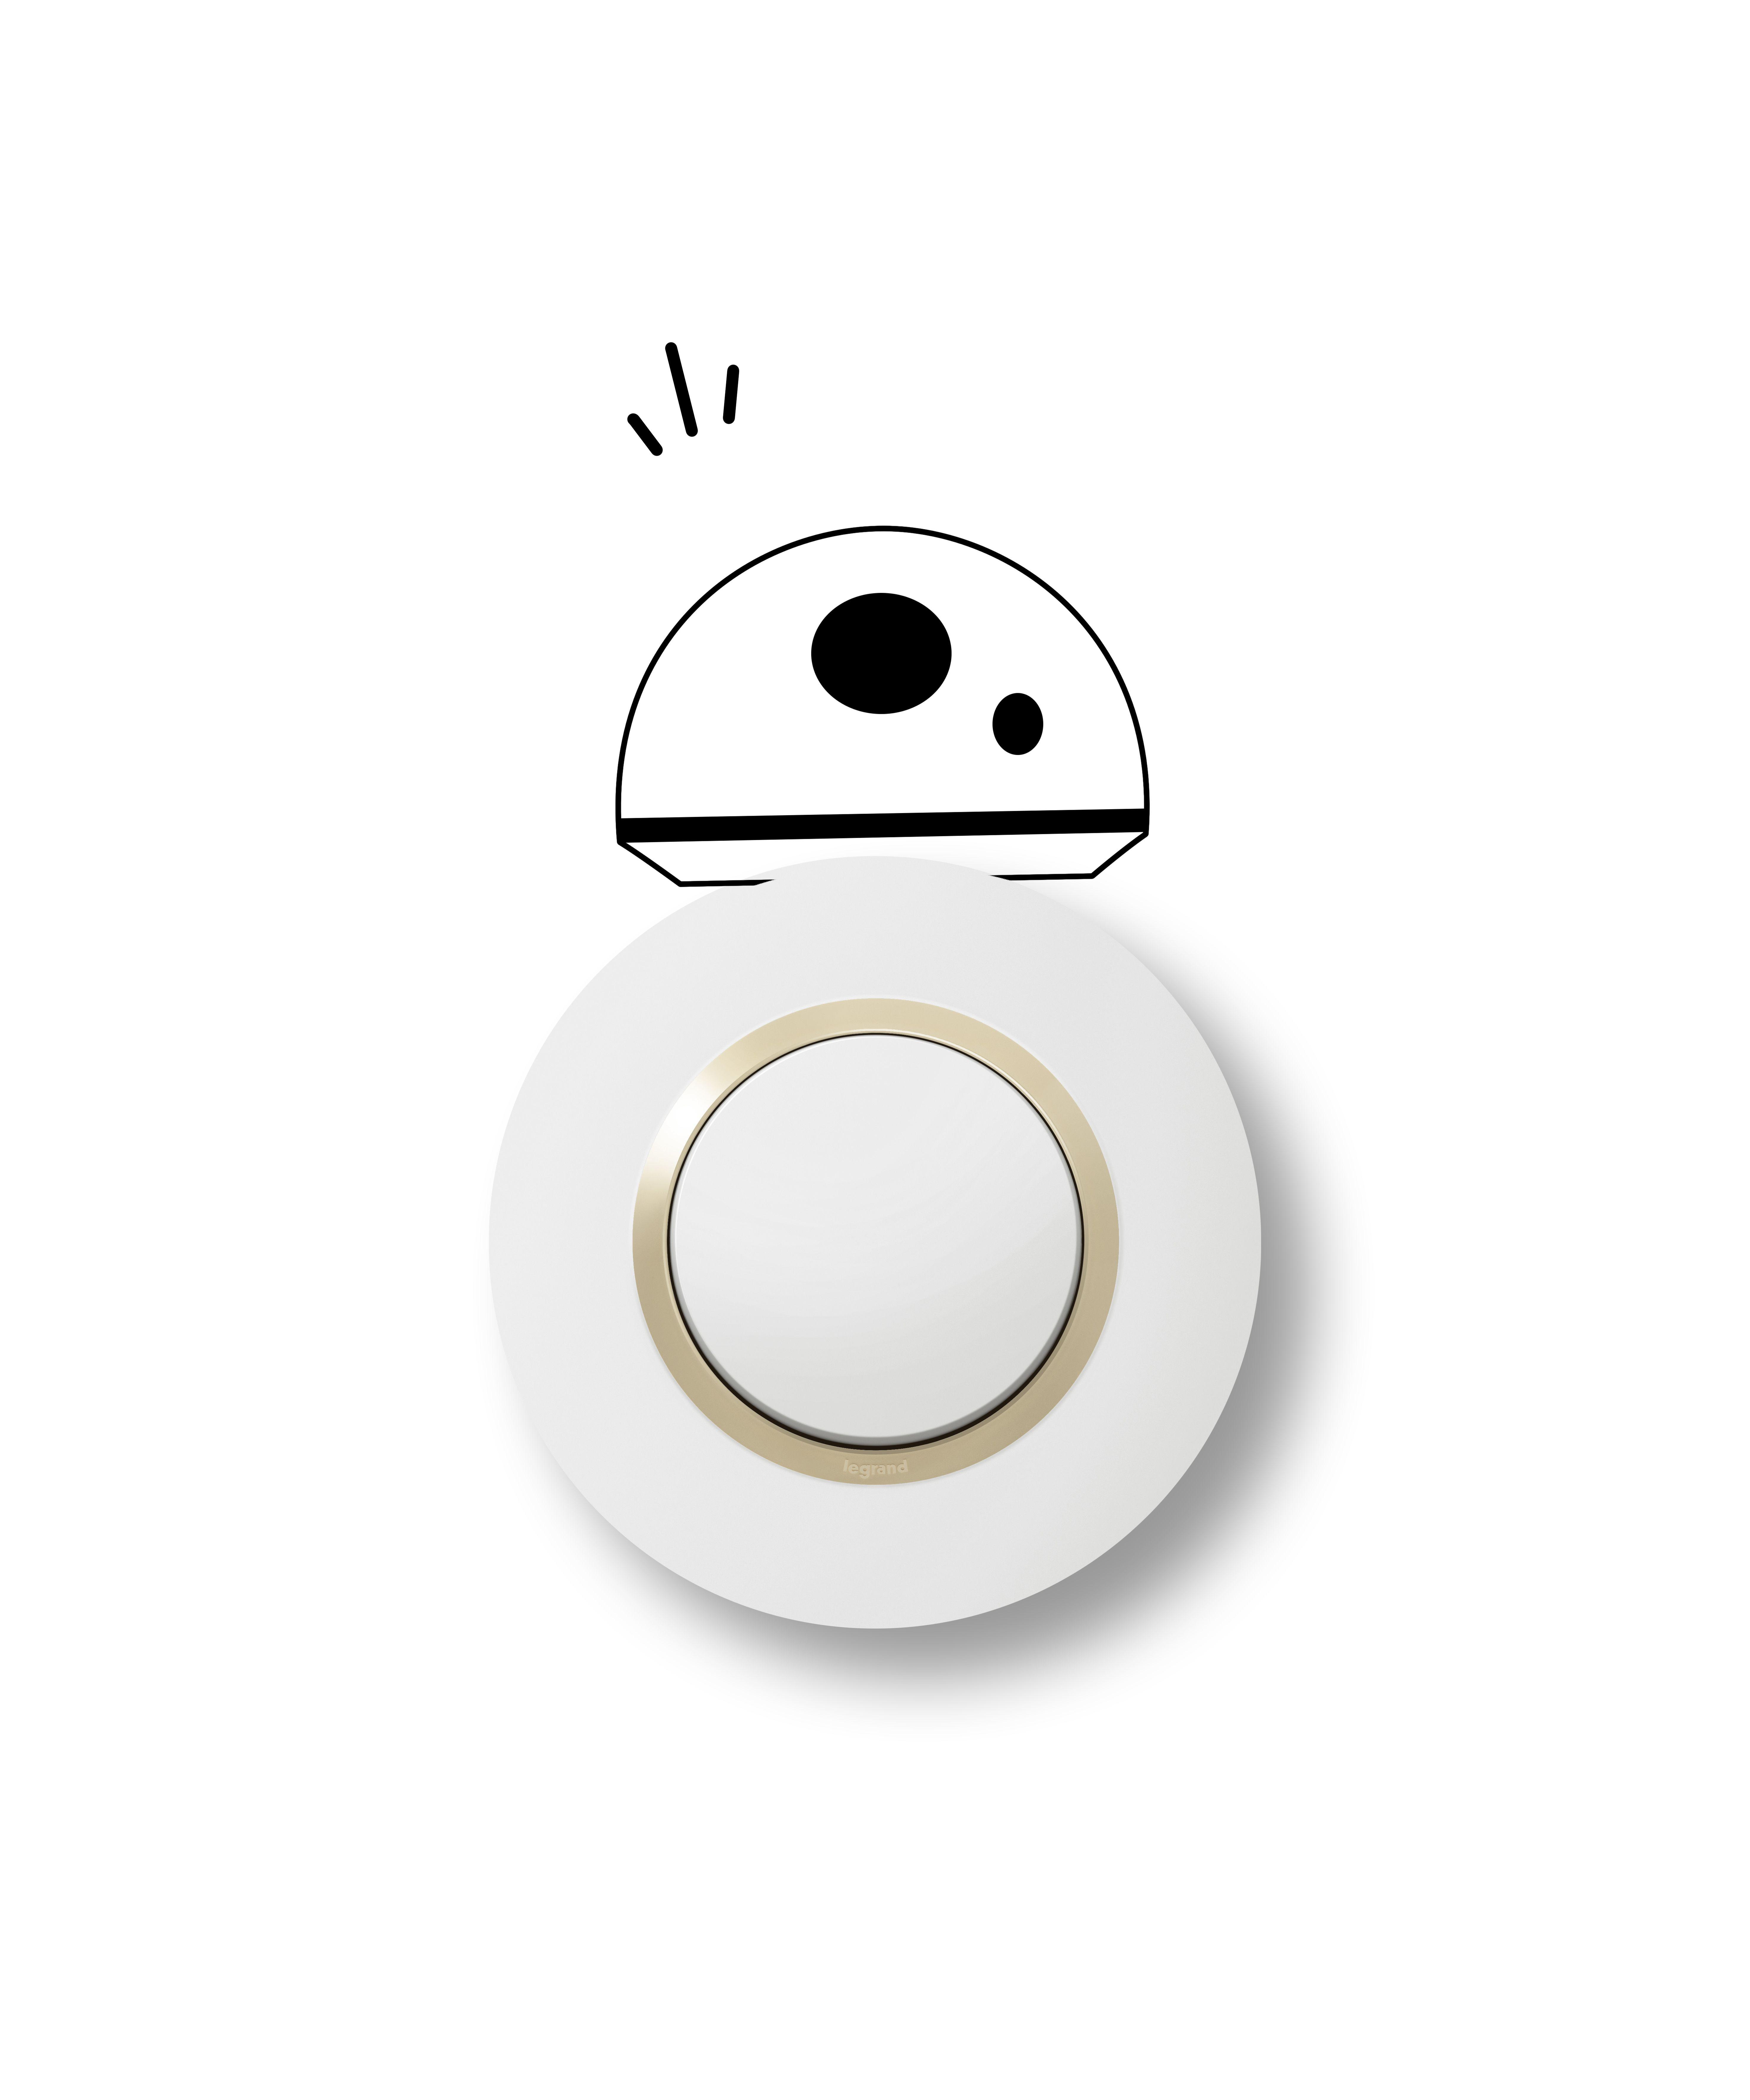 Dooxie Star Wars Interrupteurs Interrupteur Simple Prise Interrupteur